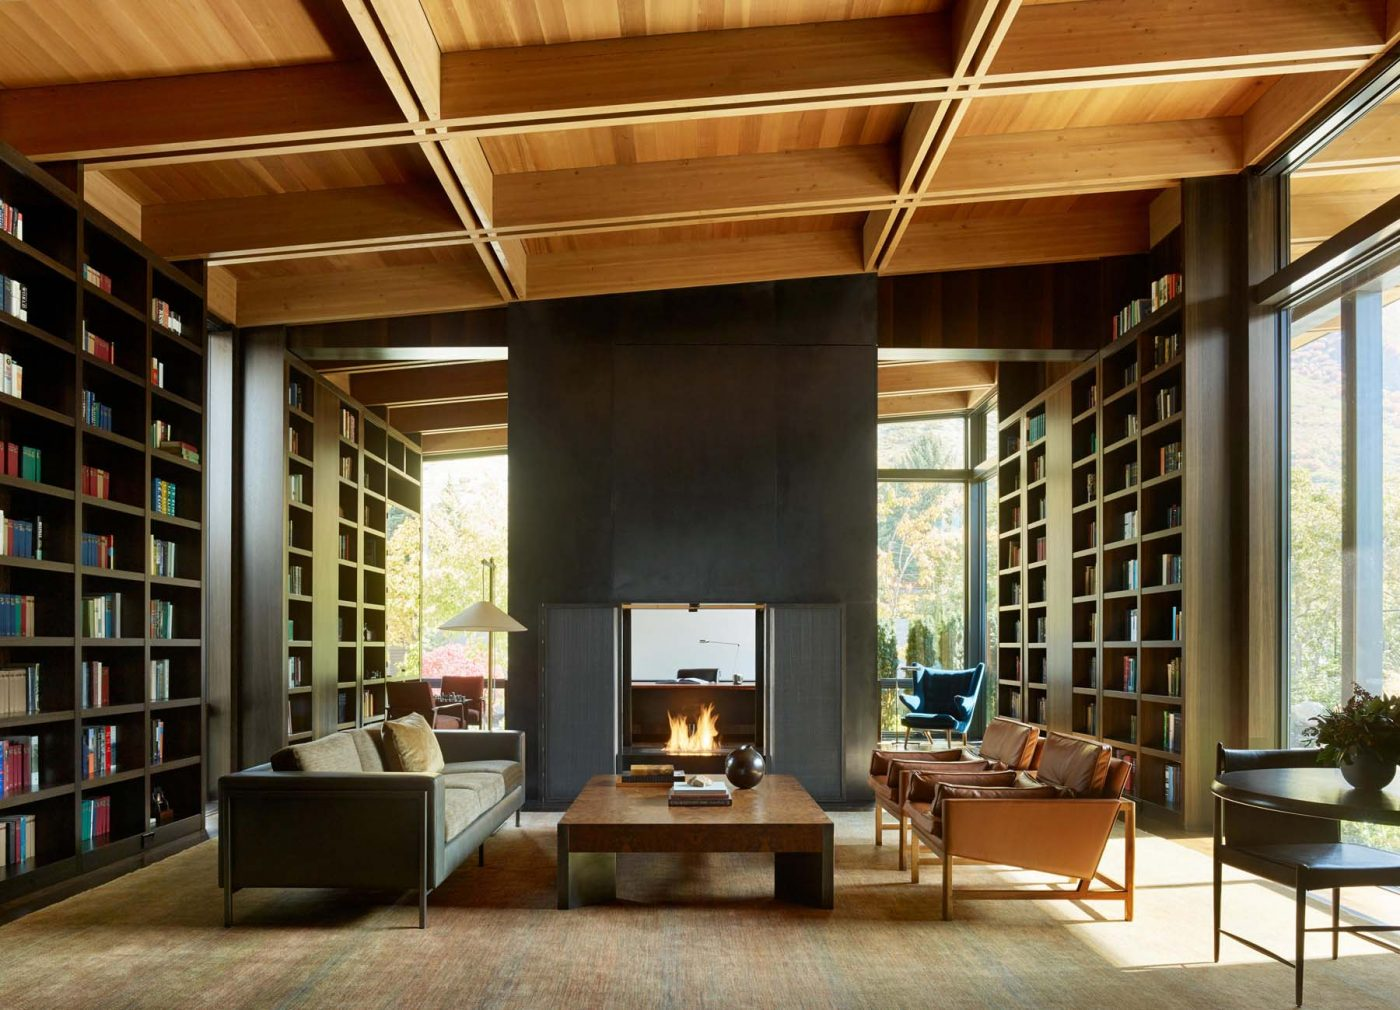 Architect Tom Kundig Olson Kundig Salt Lake City Wasatch House library study home office